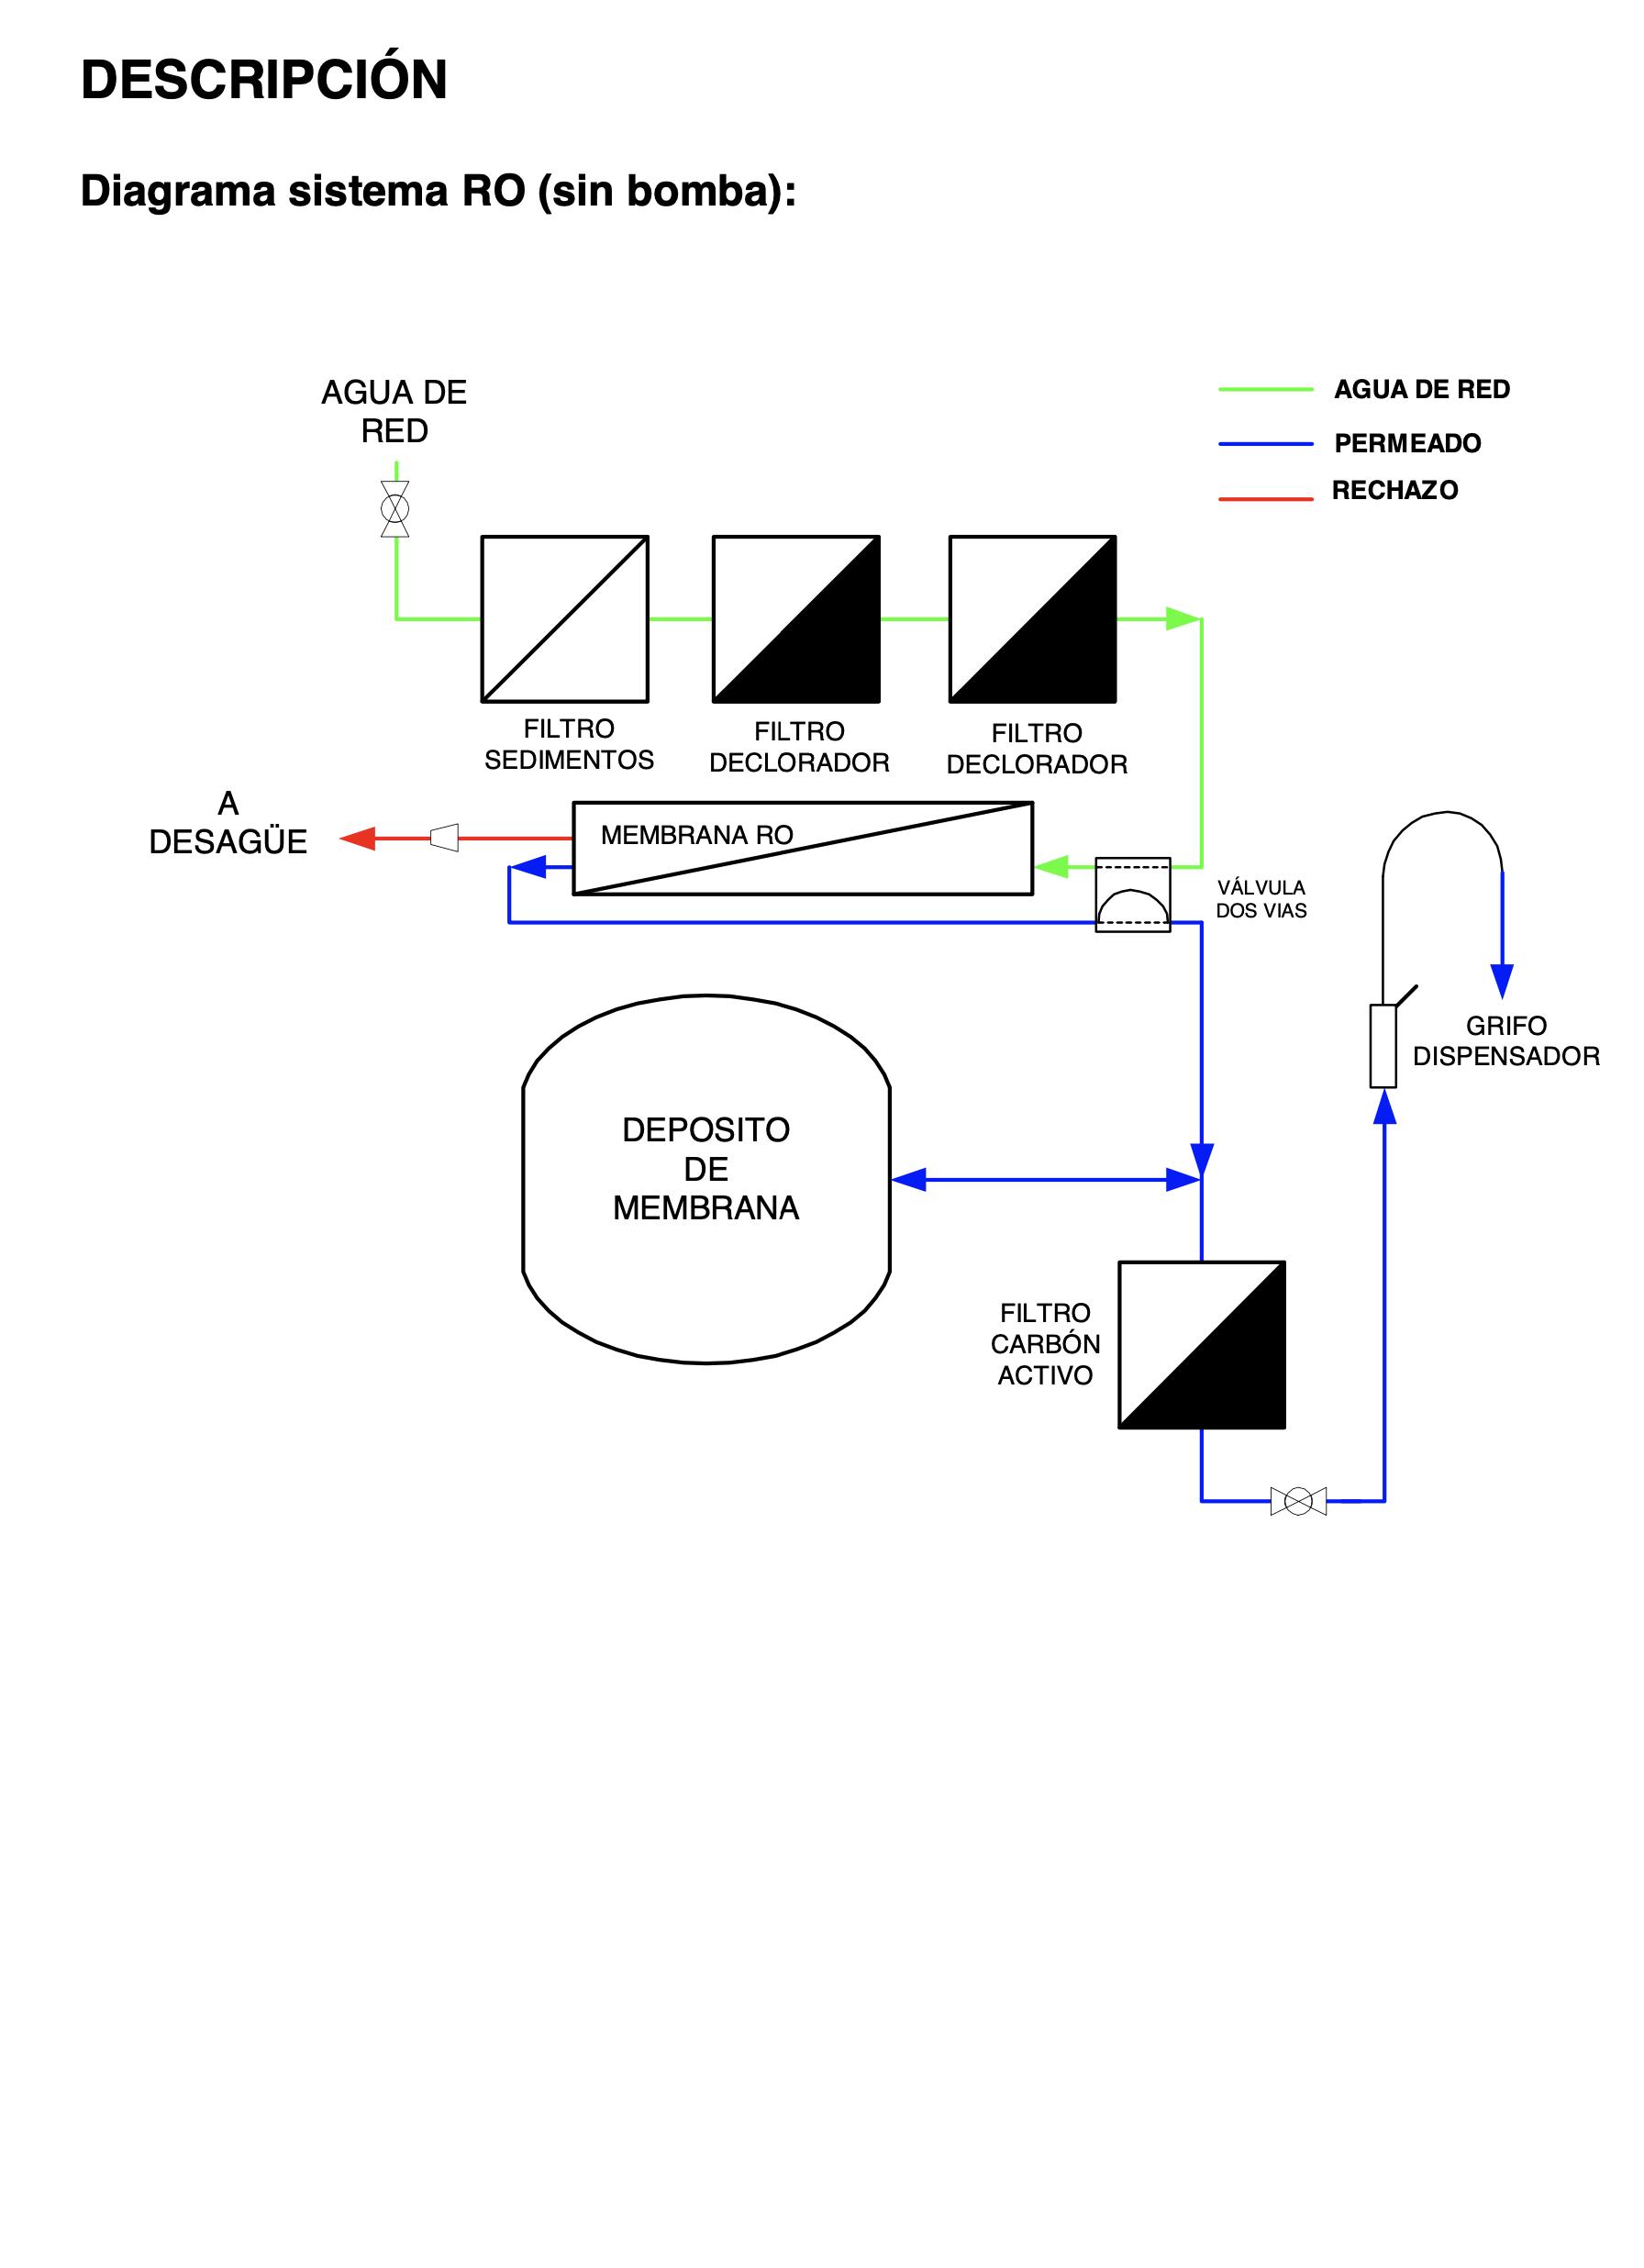 Y Membrana Osmosis Idrapure Compact inversa IDRANIA Cartuchos 1 4